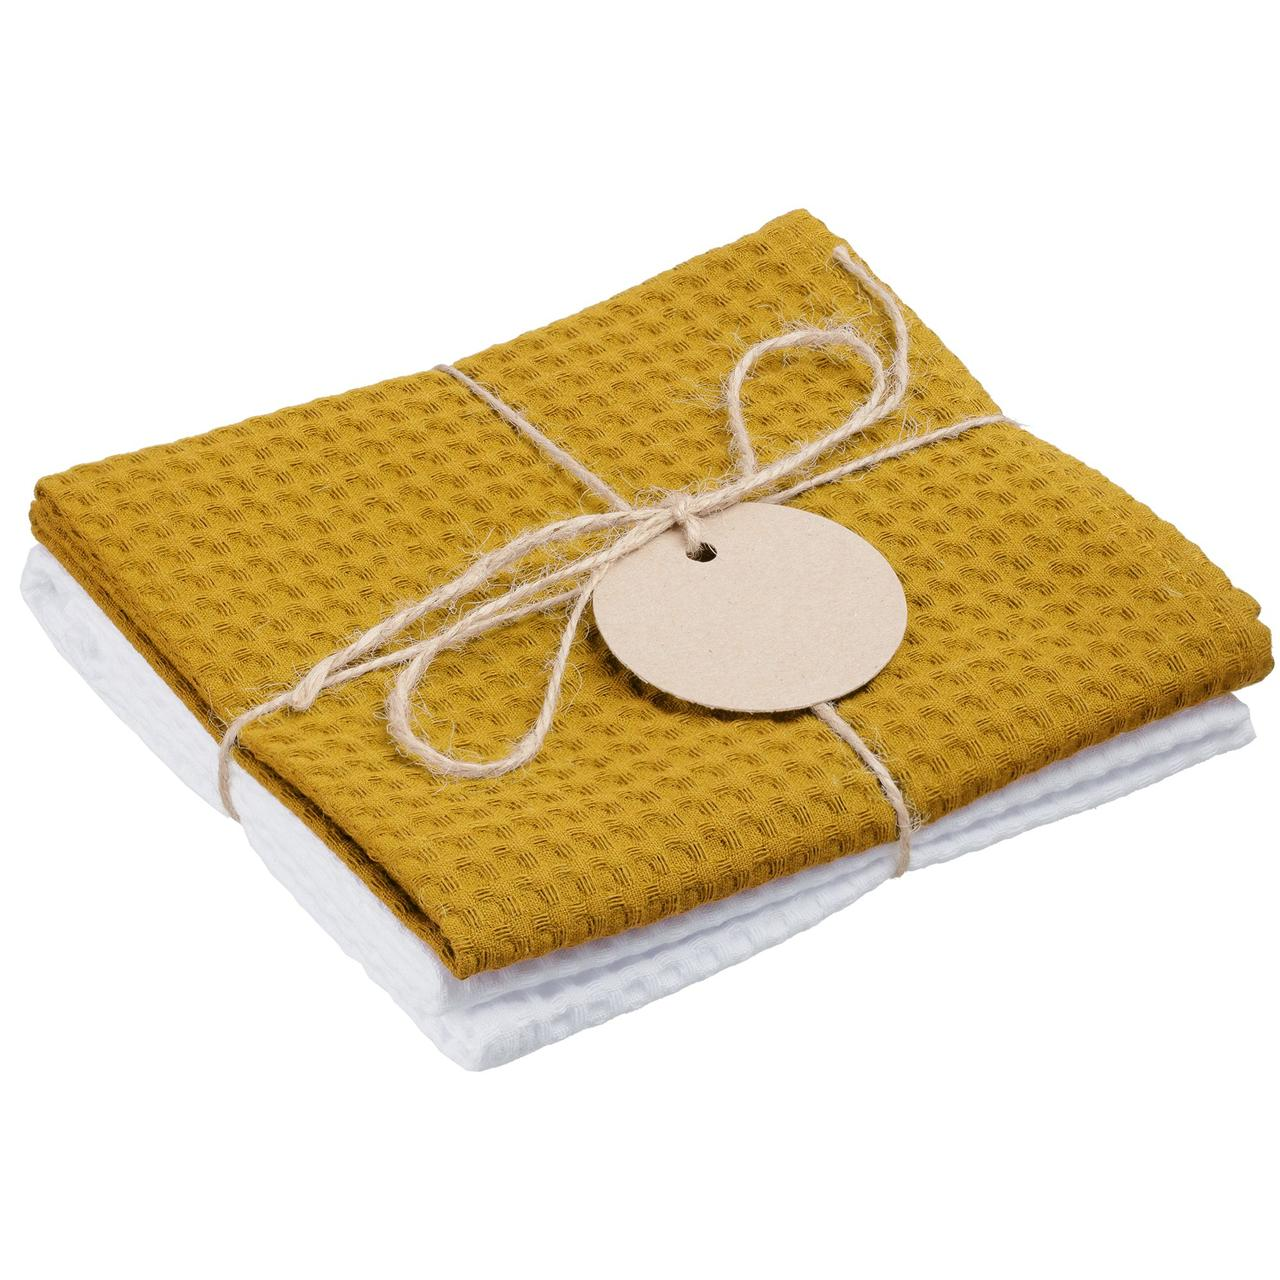 Набор кухонных полотенец Good Wipe, белый с желтым (артикул 11176.68)